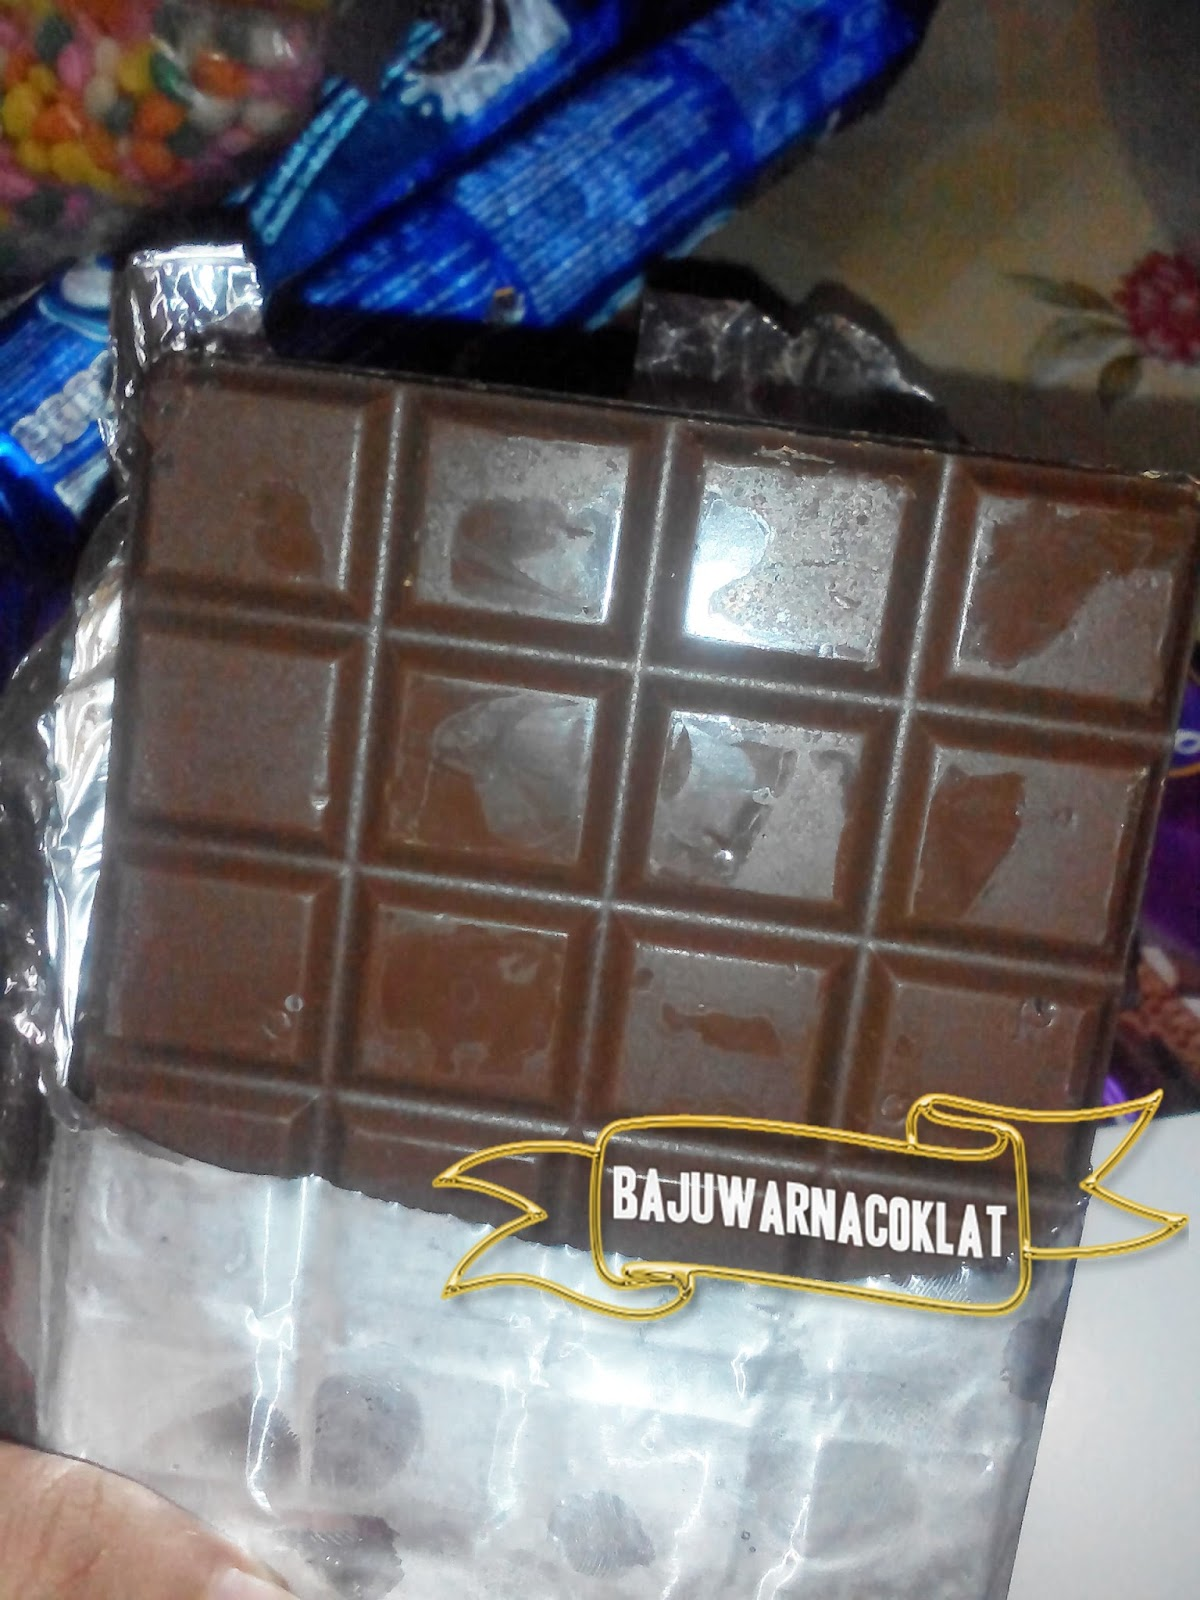 52 Gambar Warna Coklat Mudah Paling Hist